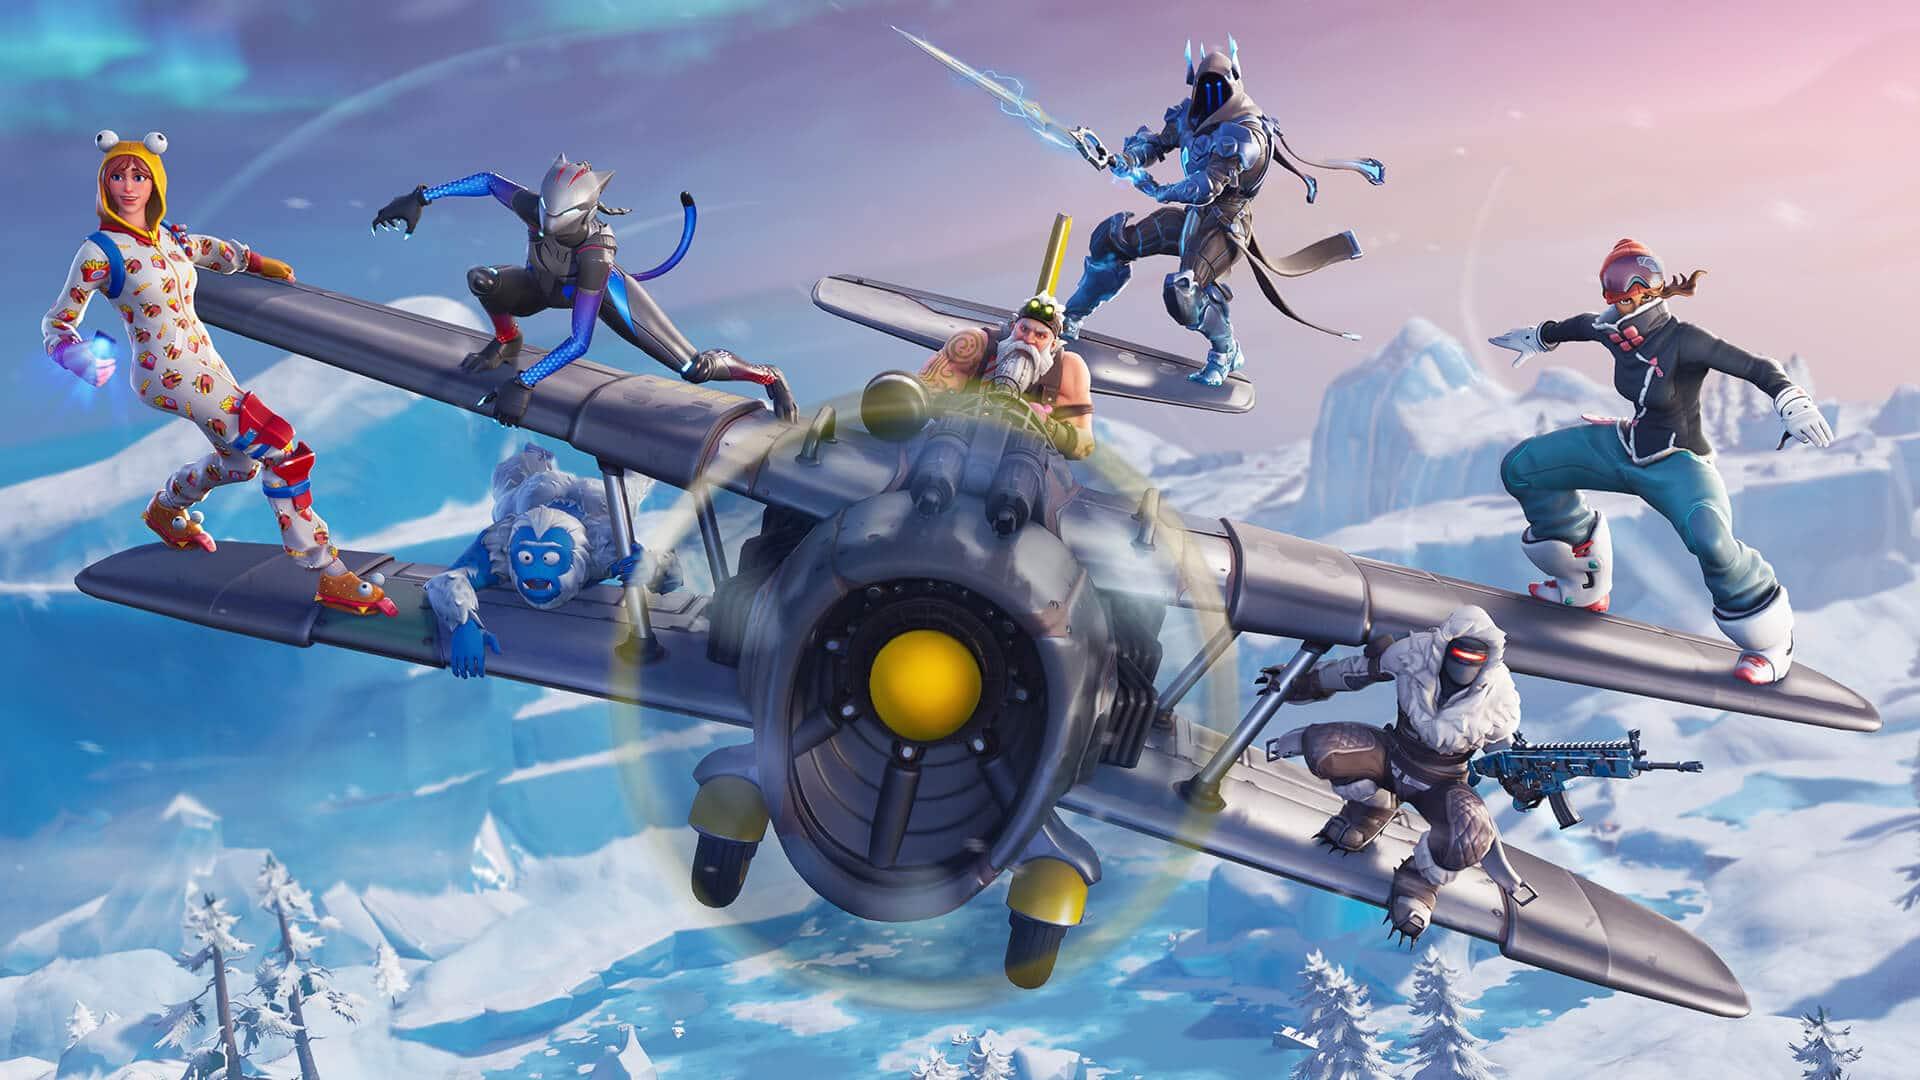 Fortnite Season 7 Loading Screen Plane